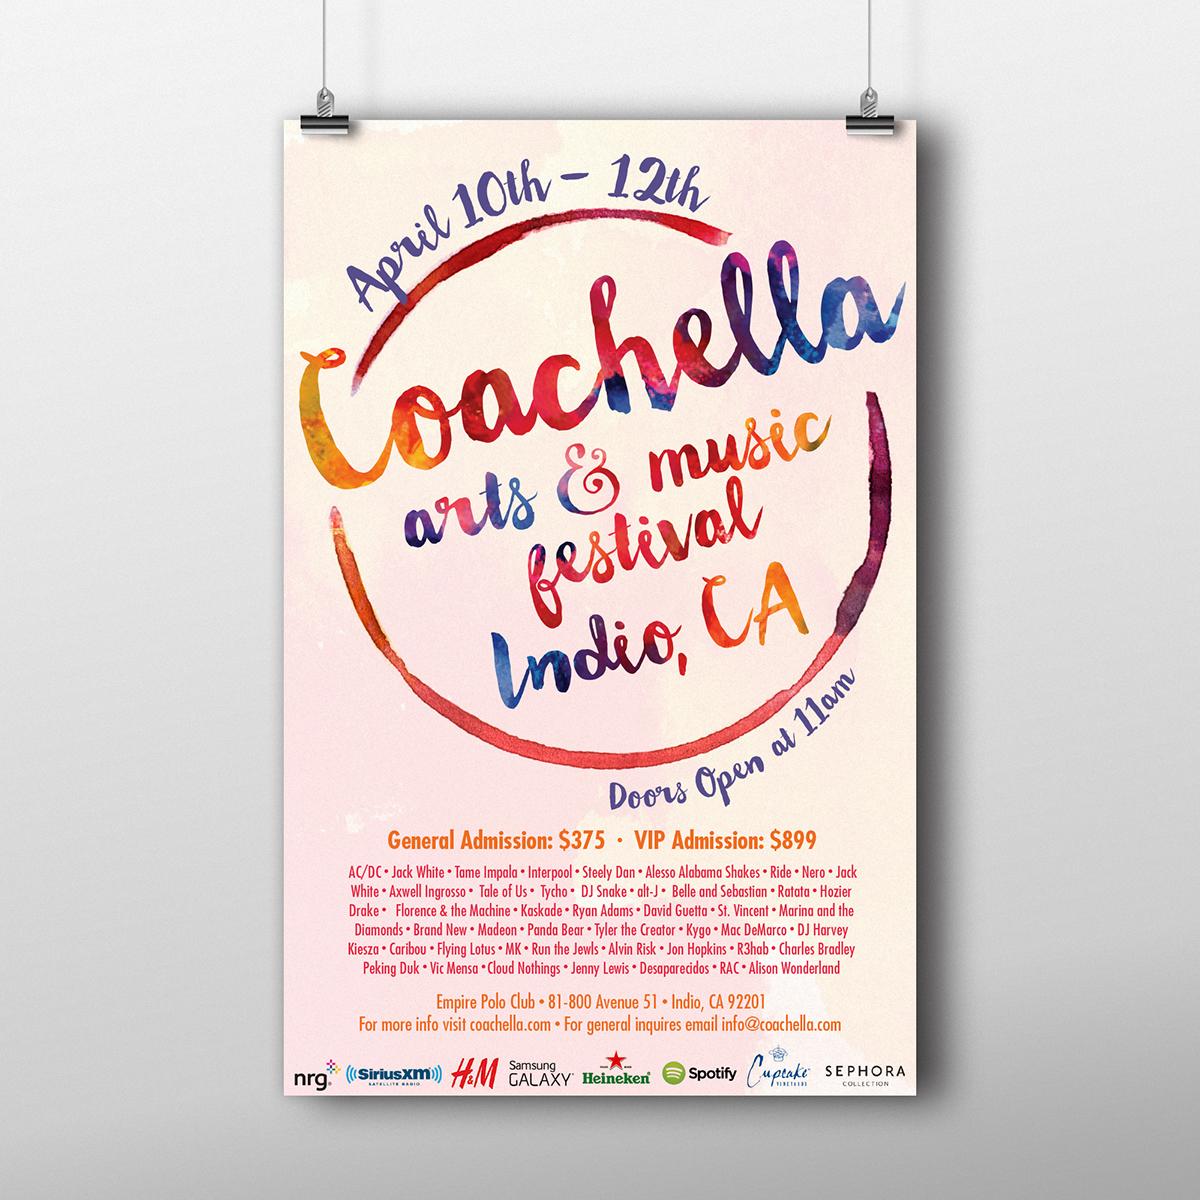 Coachella Arts & Music Festival Poster Design On Behance